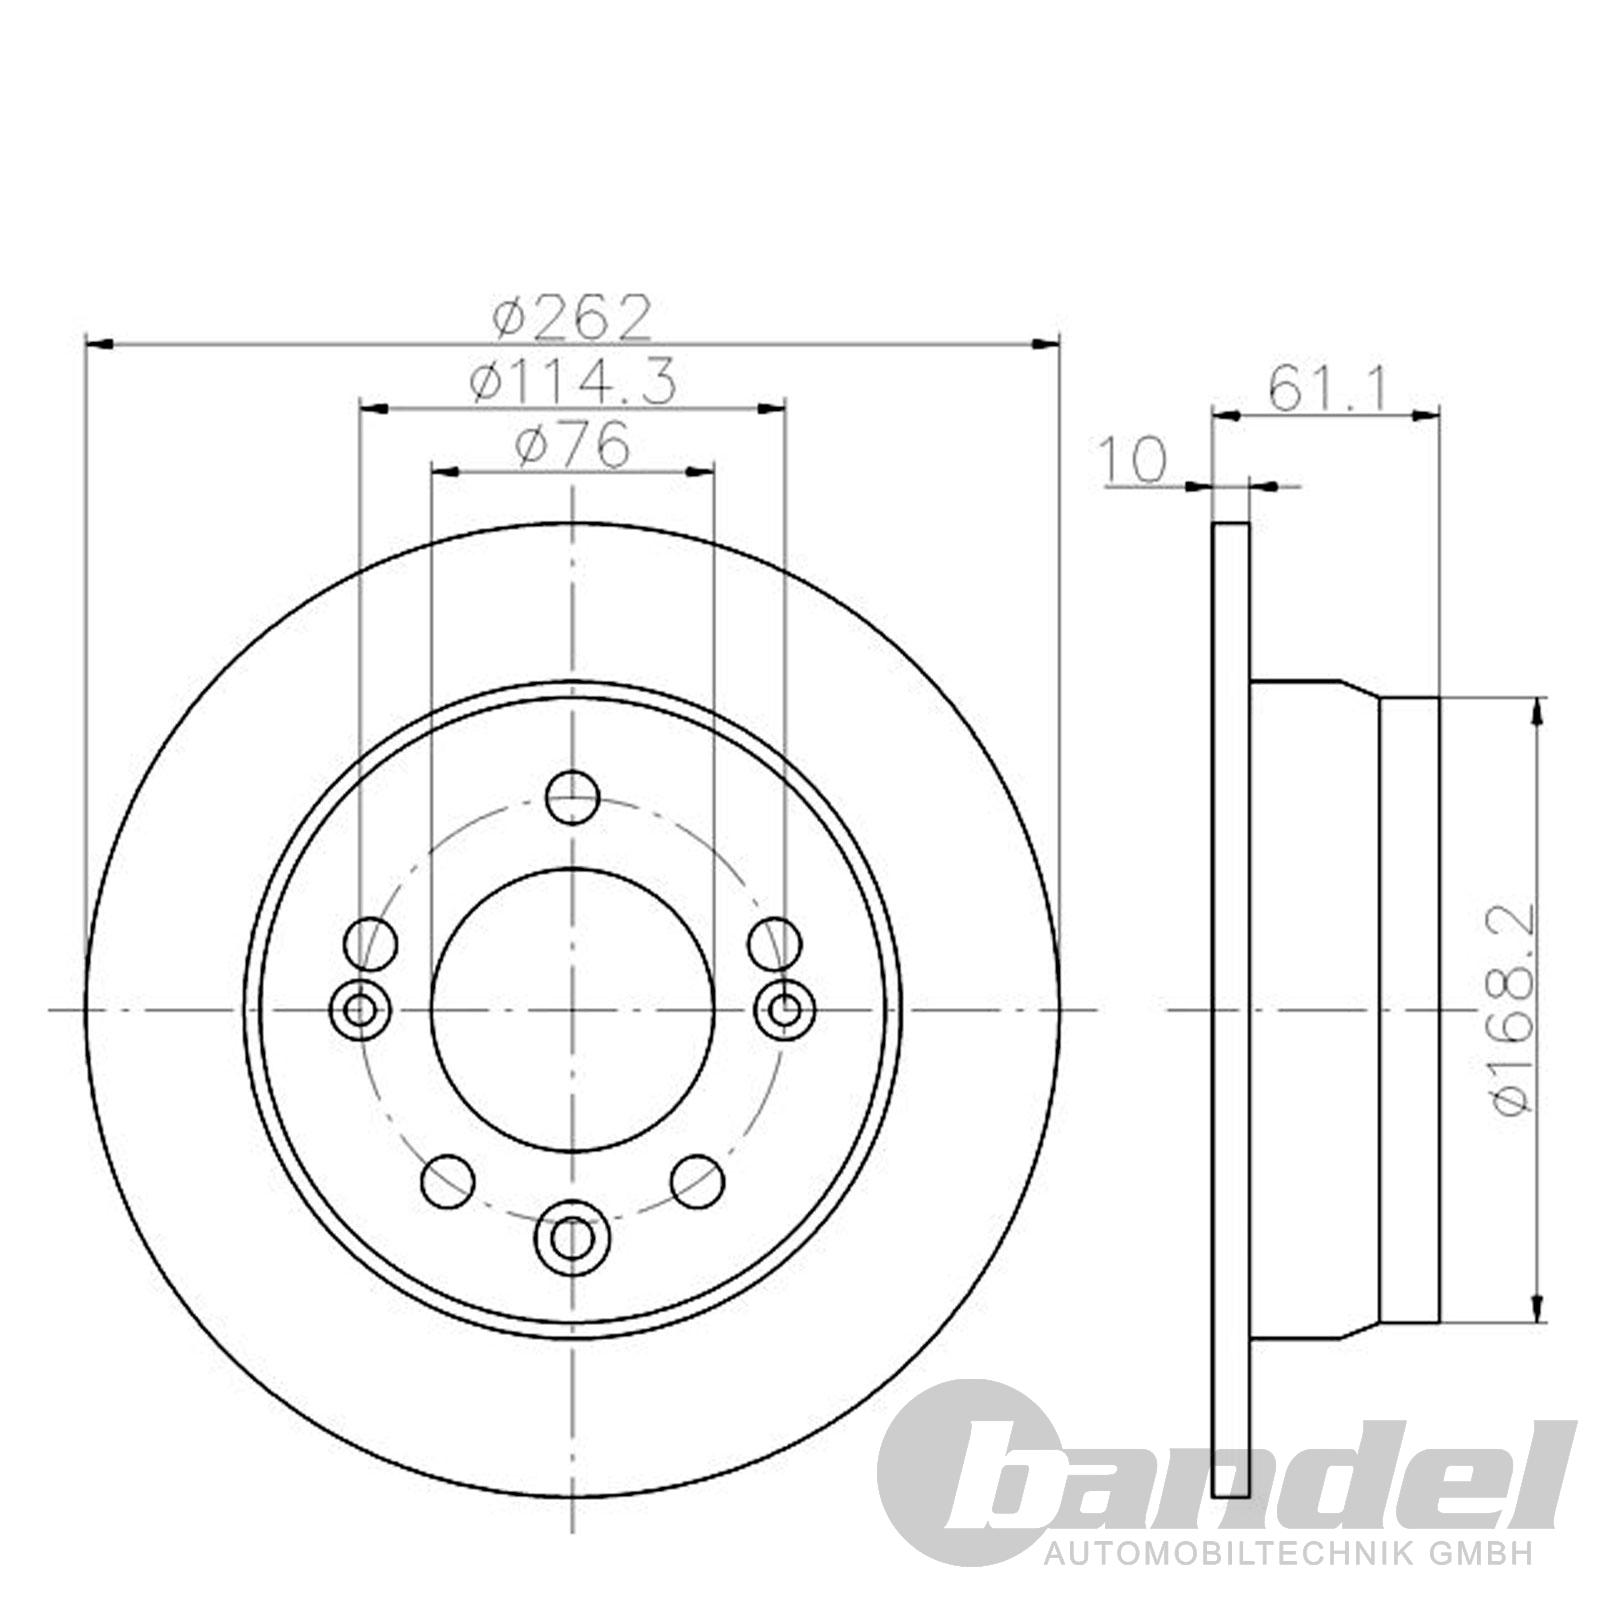 2 bremsscheiben 262mm bel ge hinten hyundai ix35 tucson. Black Bedroom Furniture Sets. Home Design Ideas